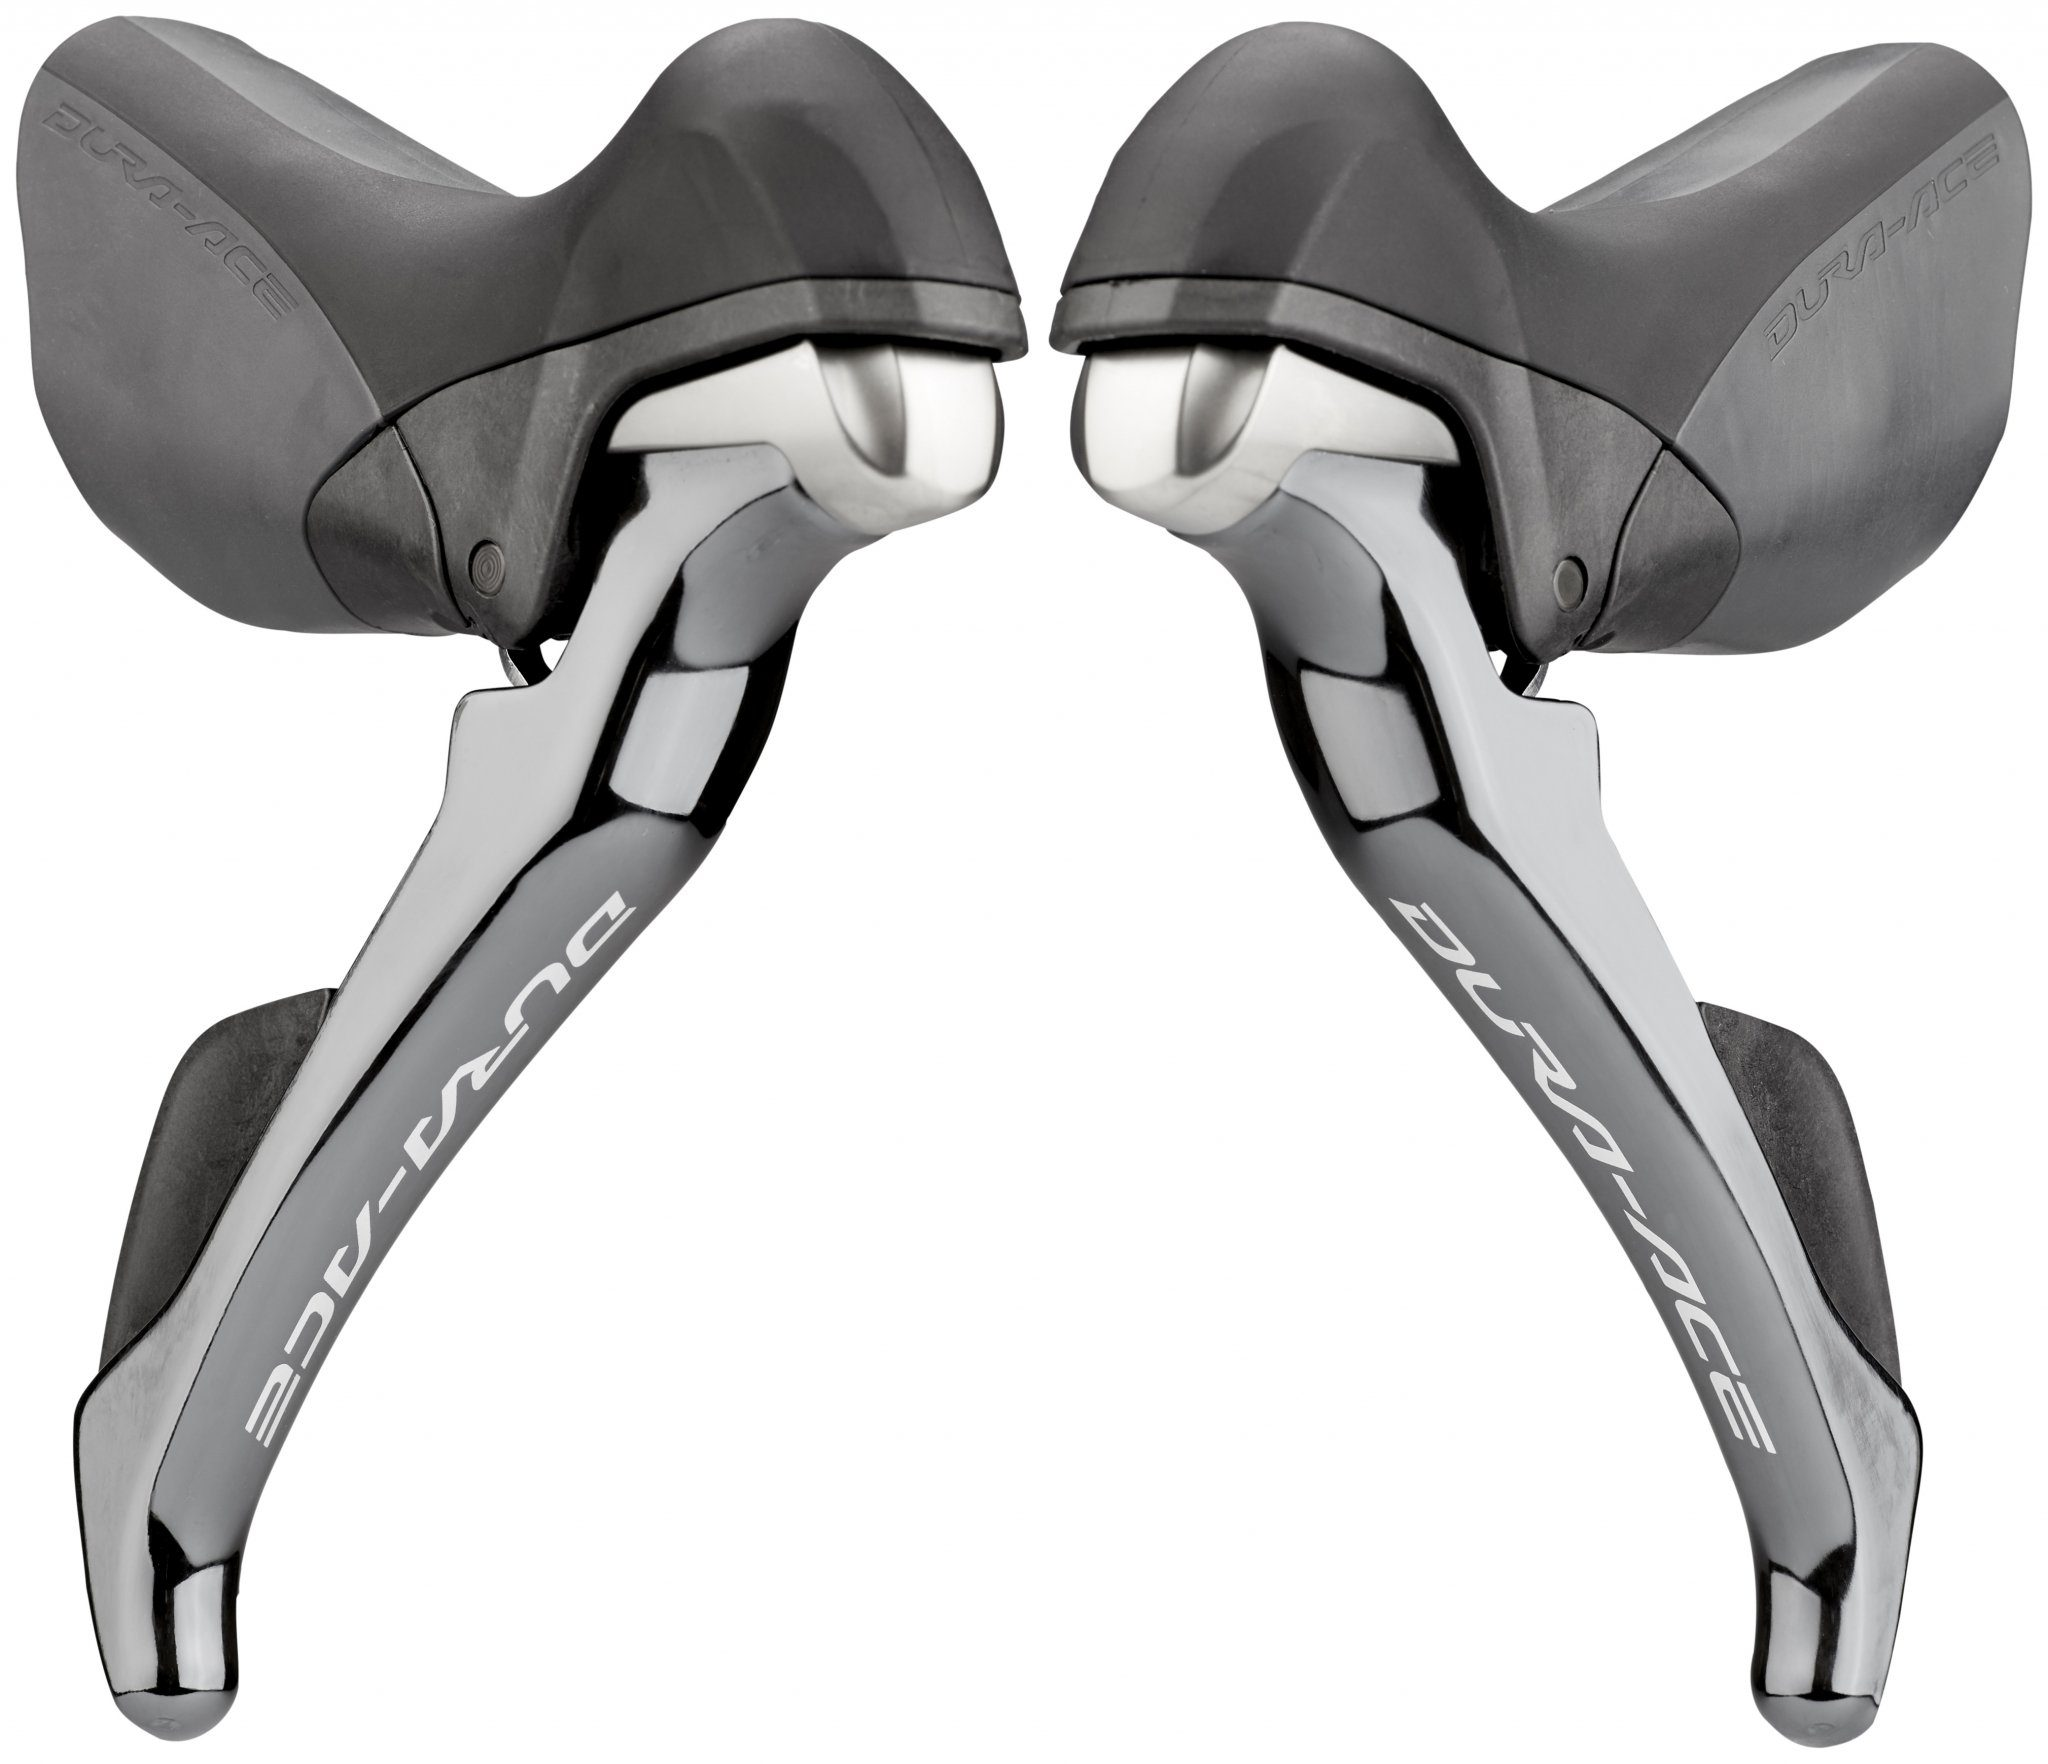 Shimano Schaltung »Dura Ace ST-9001 Schalt-/Bremshebelpaar 2x11-fach«